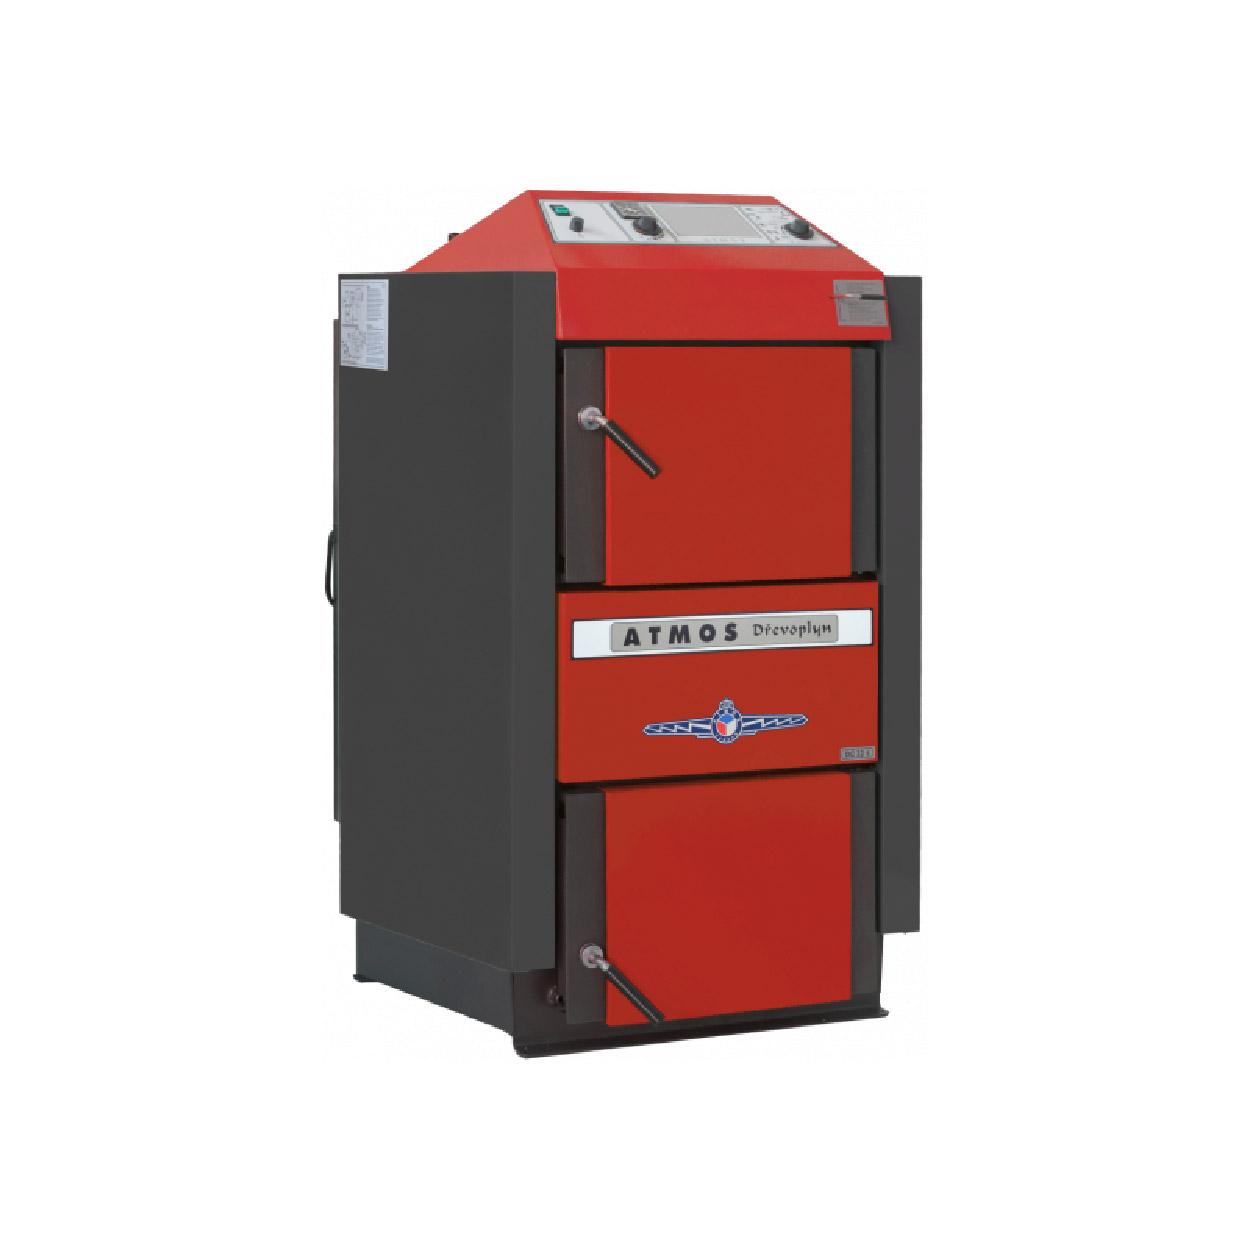 Centrala termica pe lemne ATMOS DC70GSX 70 kW fornello imagine